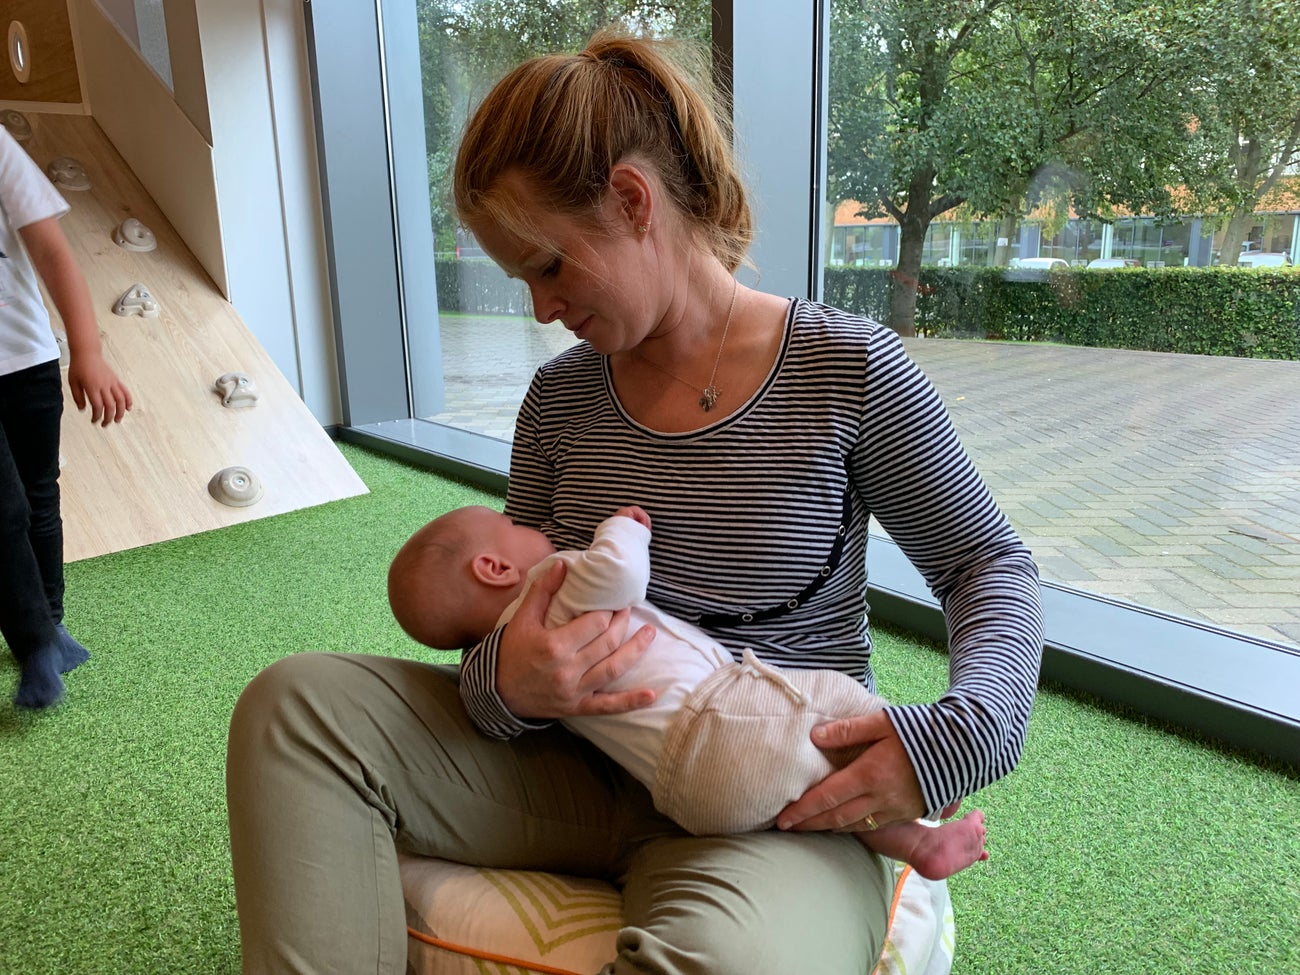 Woman feeding baby wearing Peekaboobie cotton nursing or breastfeeding top